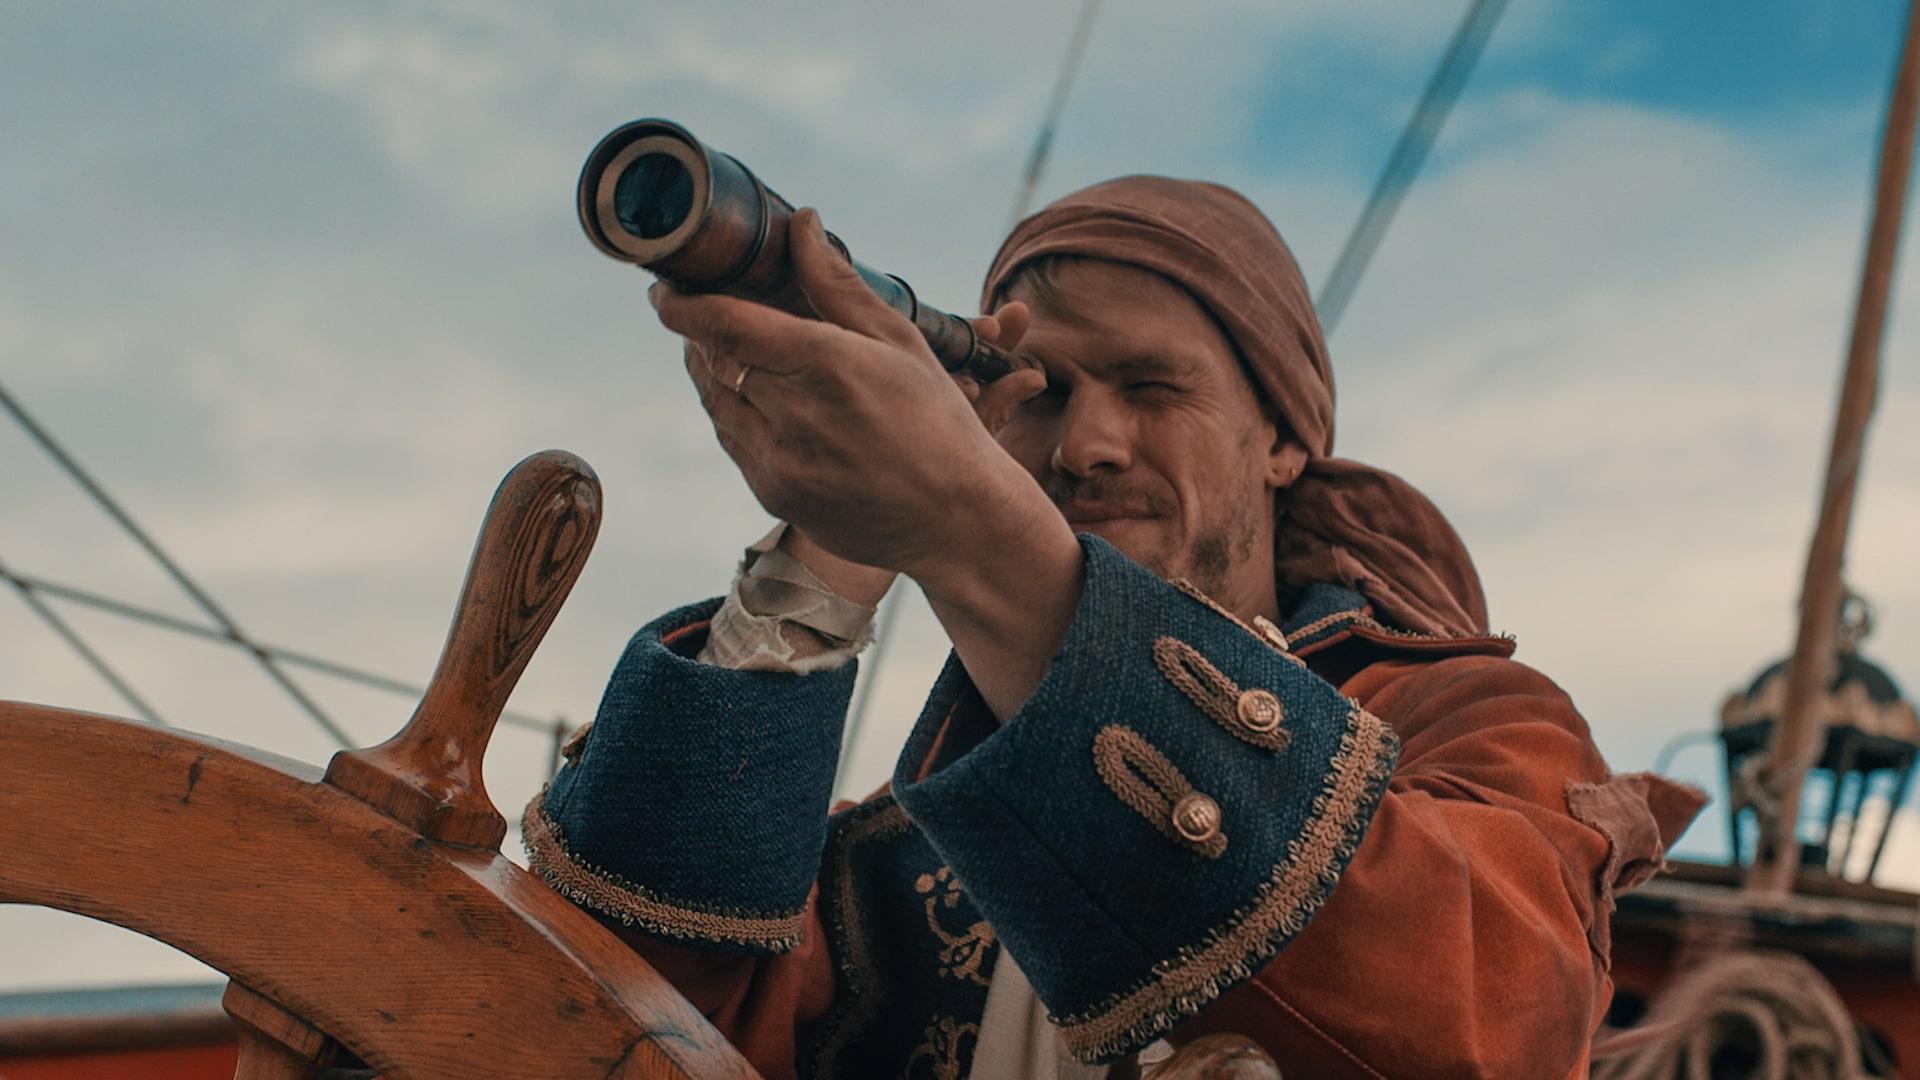 Piraten in Batavia im Europa-Park